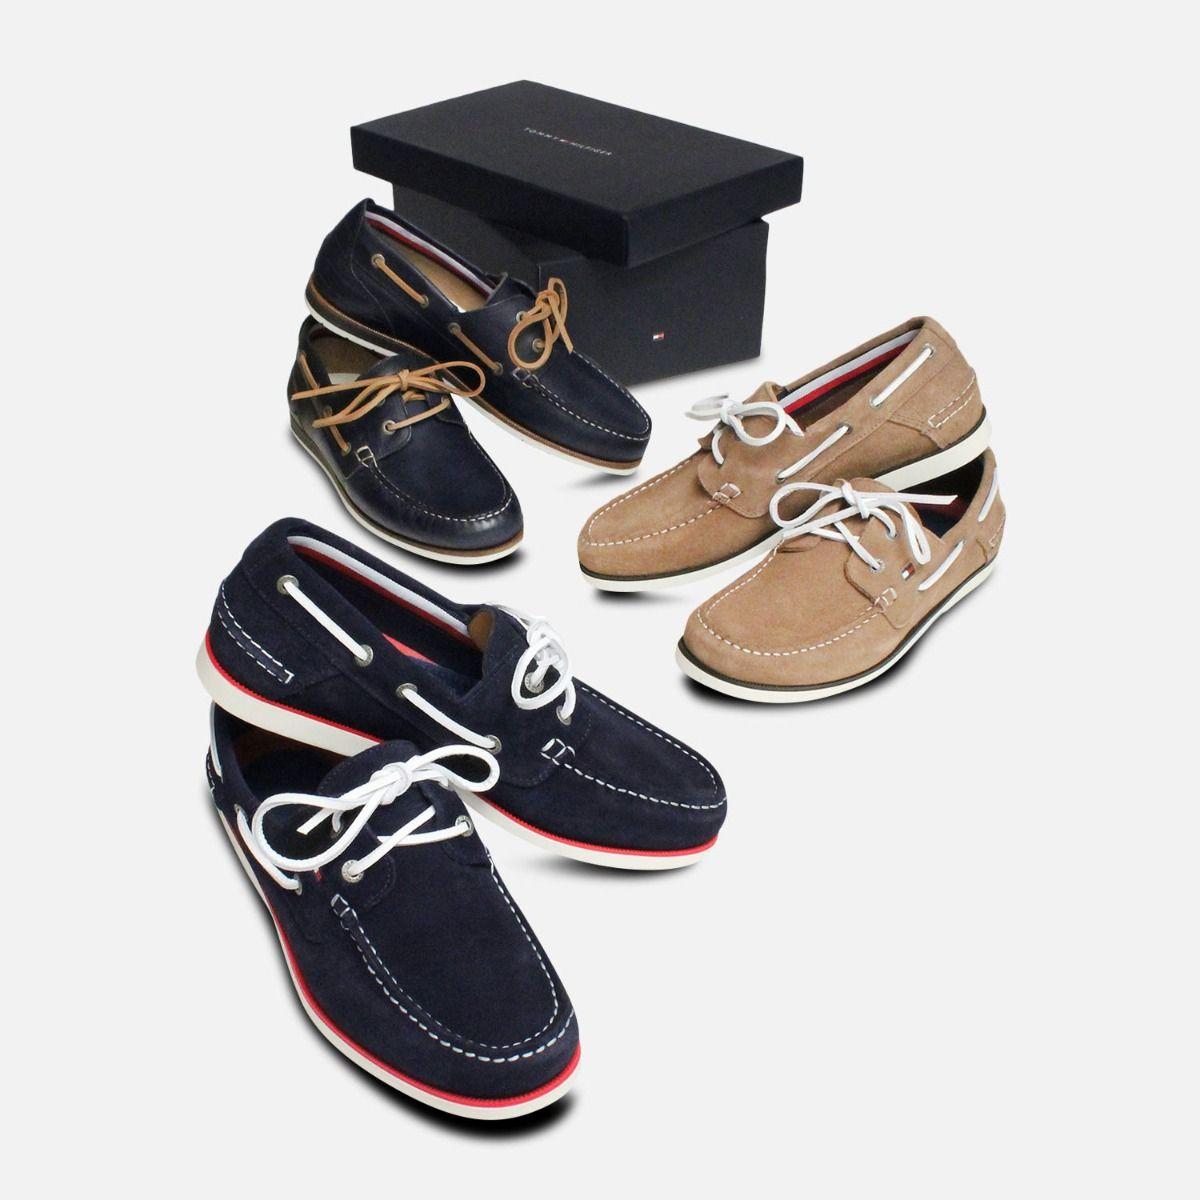 Tommy Hilfiger Navy Blue Suede Mens Boat Shoes